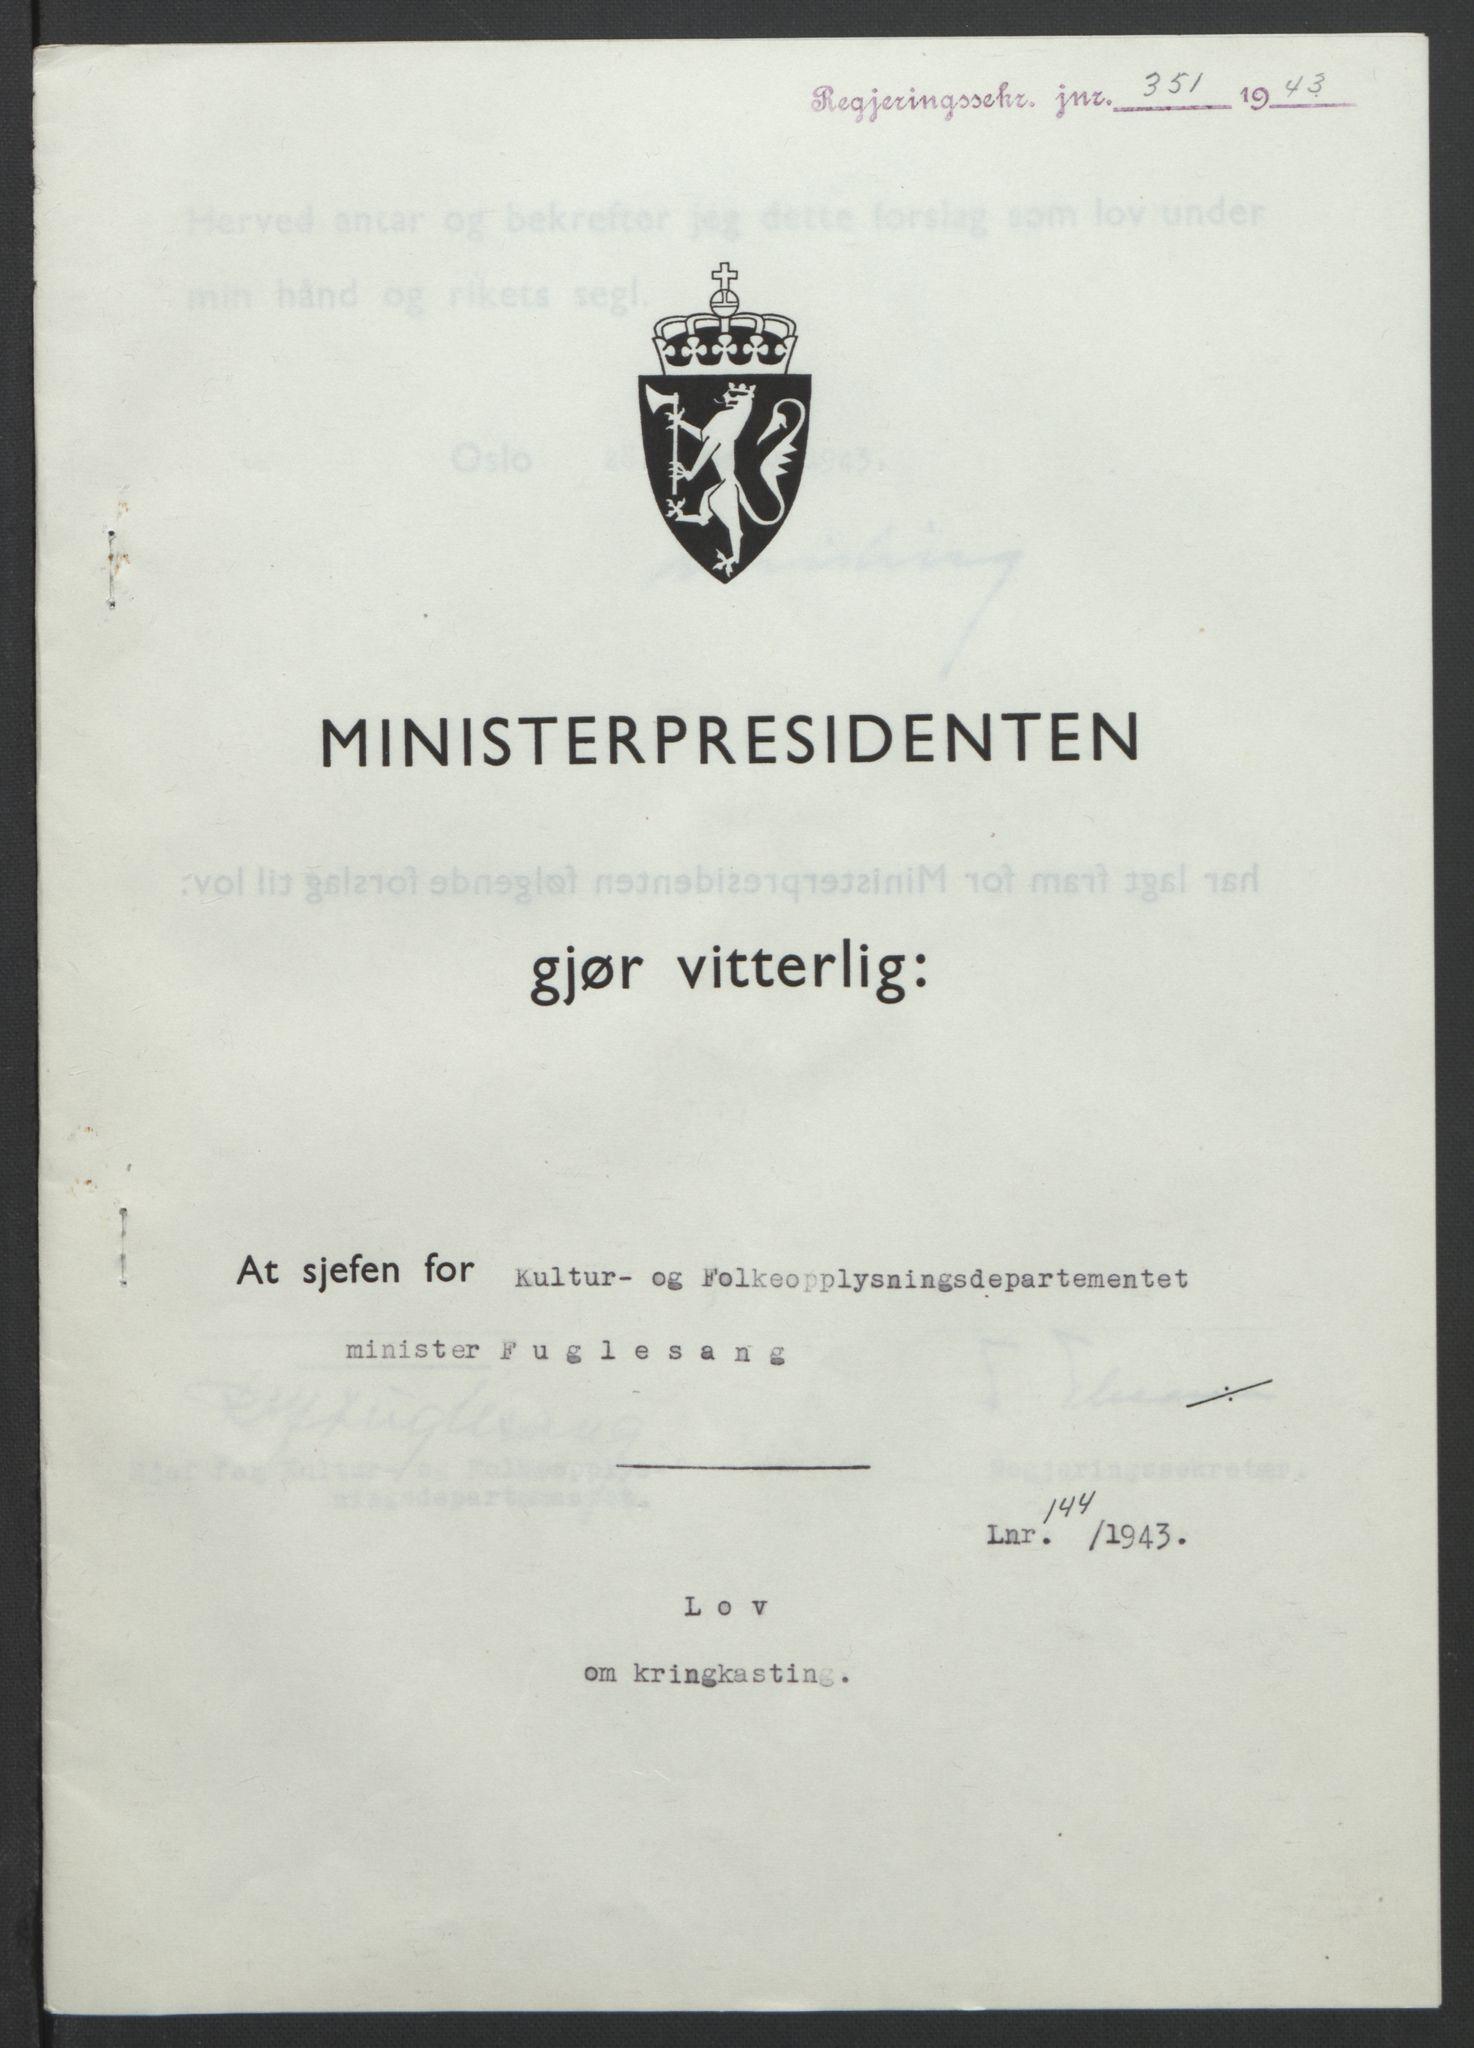 RA, NS-administrasjonen 1940-1945 (Statsrådsekretariatet, de kommisariske statsråder mm), D/Db/L0099: Lover, 1943, s. 669